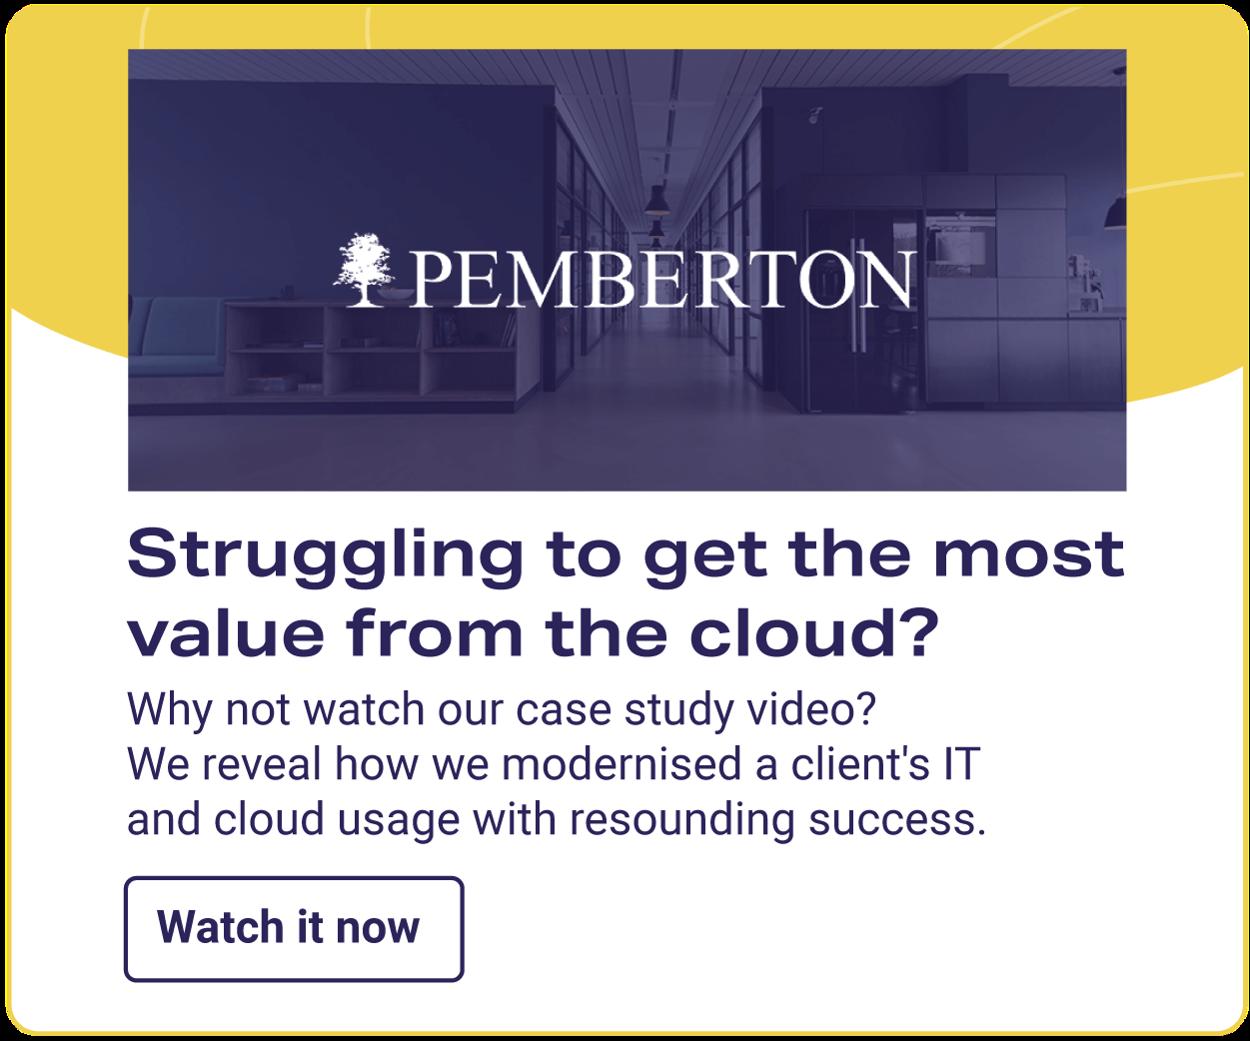 CTA for video case study for Pemberton